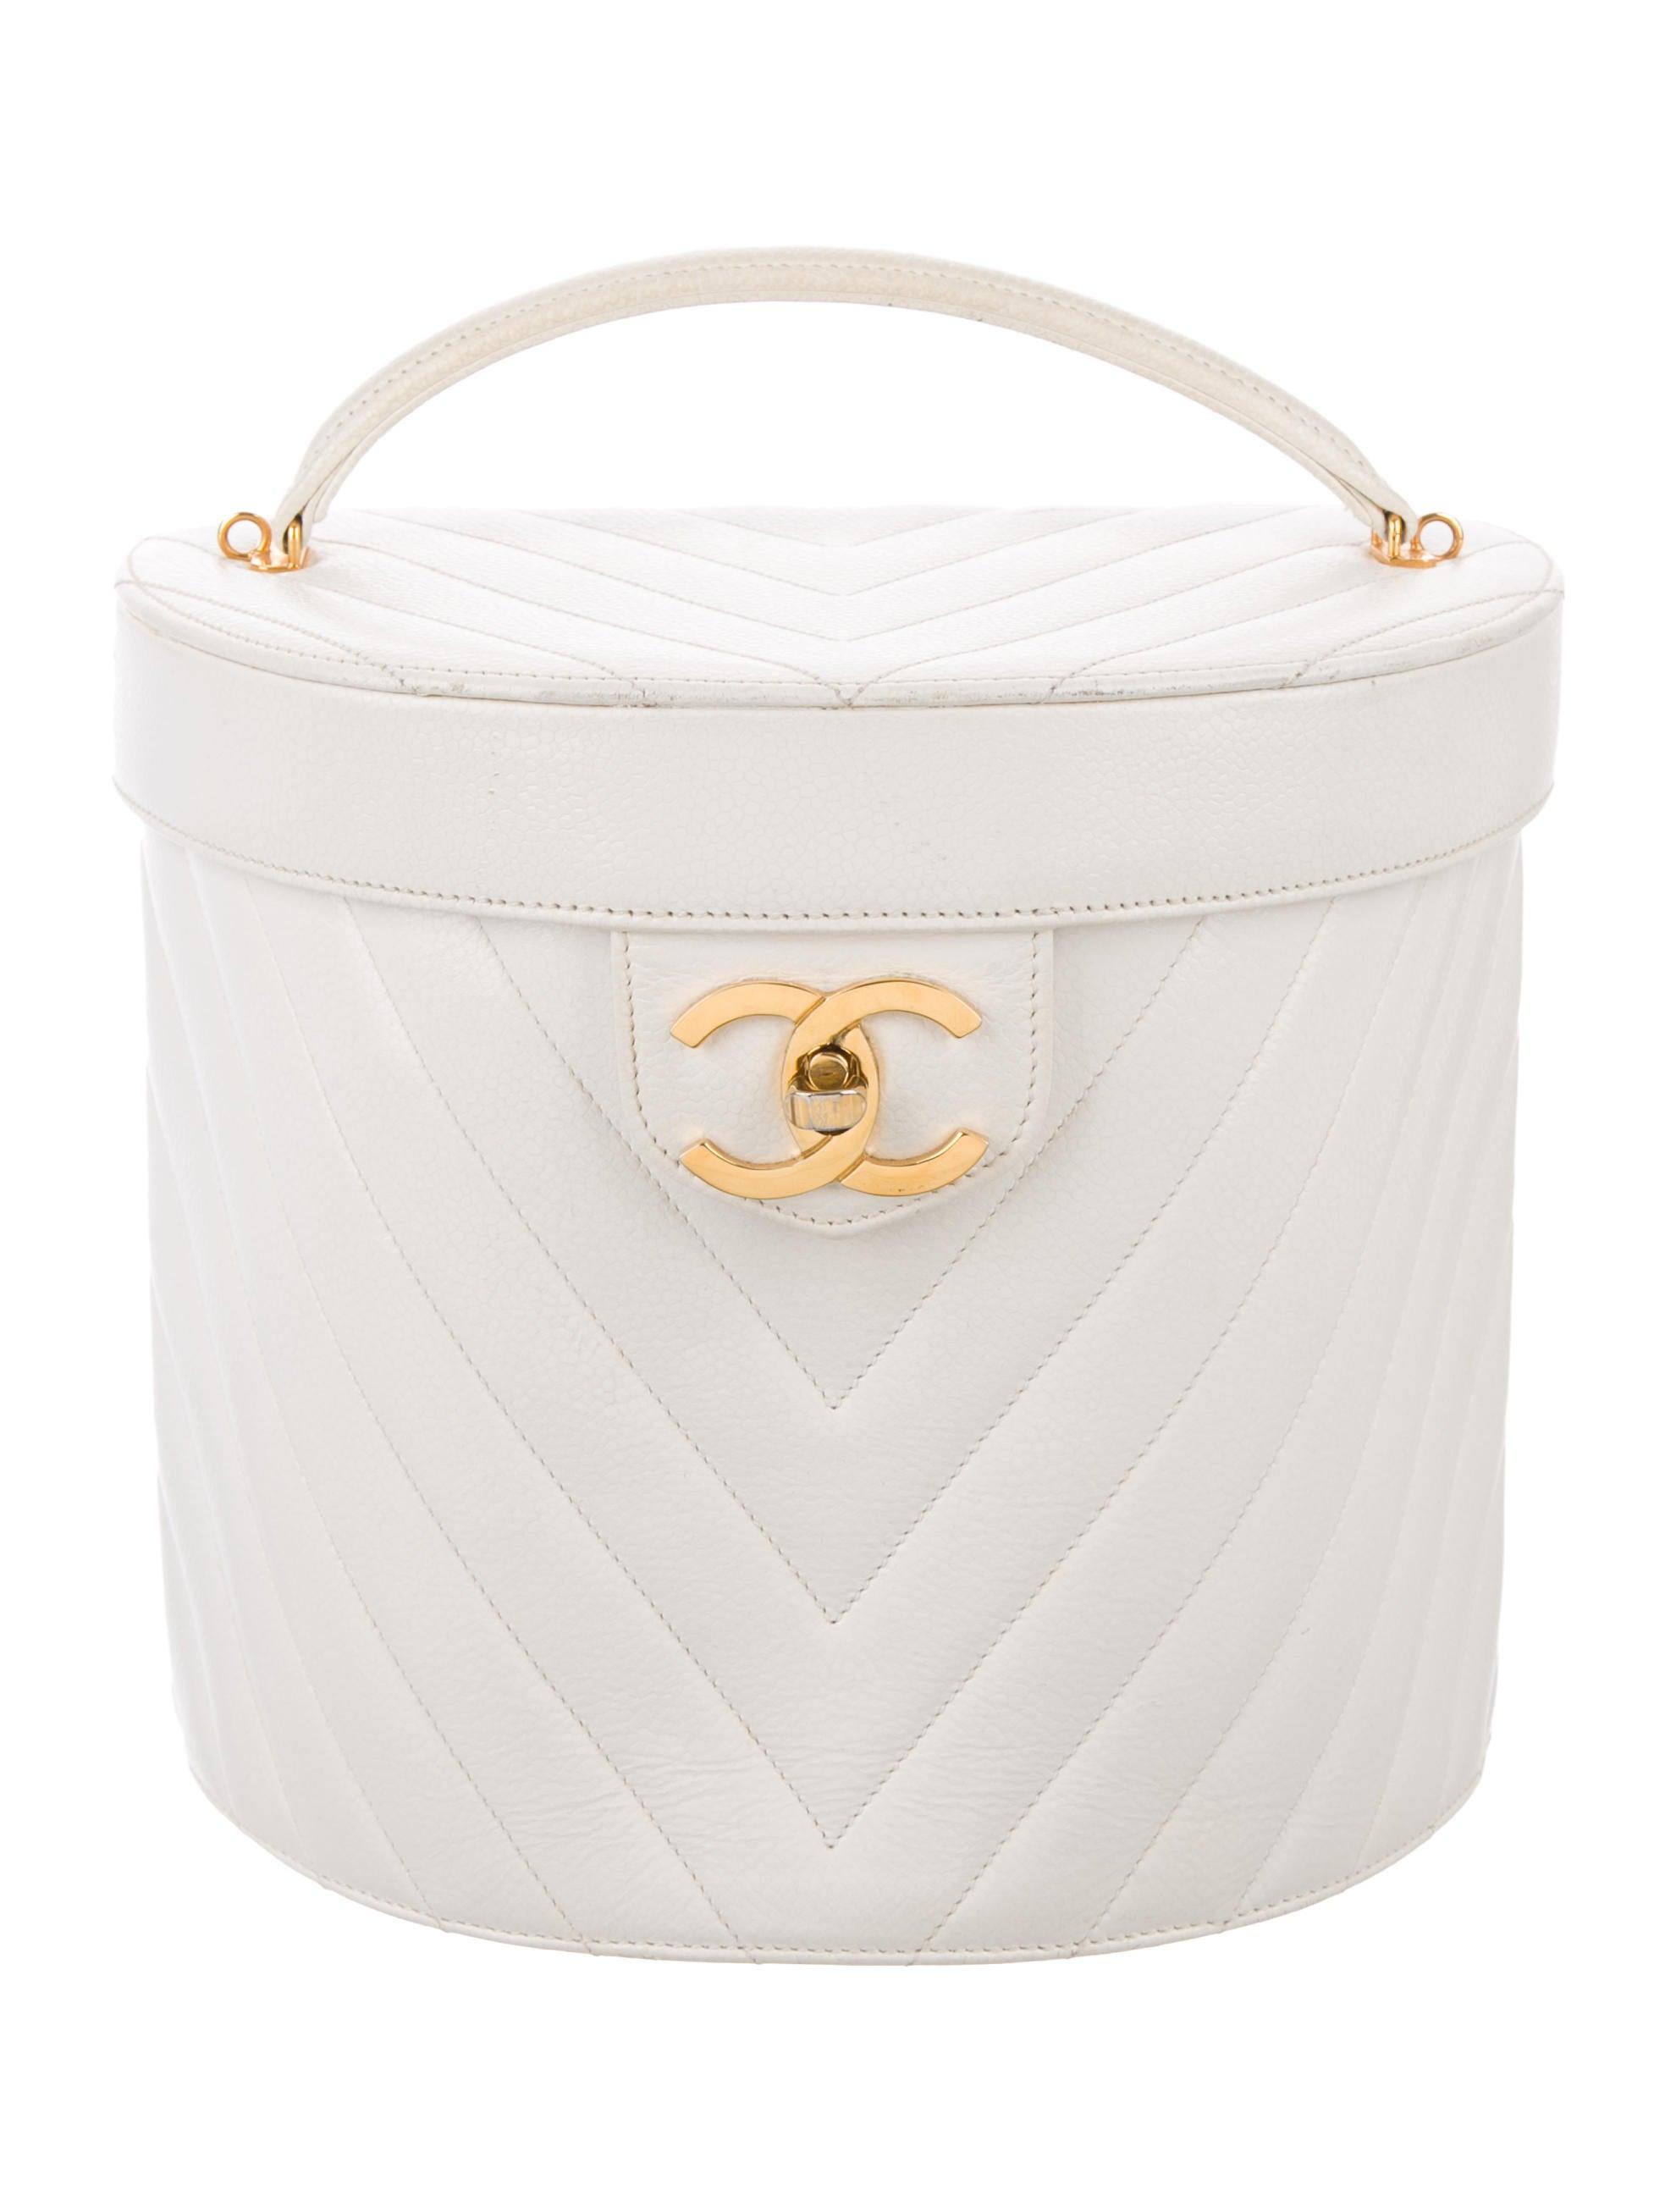 Chanel Large Chevron Vanity Case Handbags Cha112886